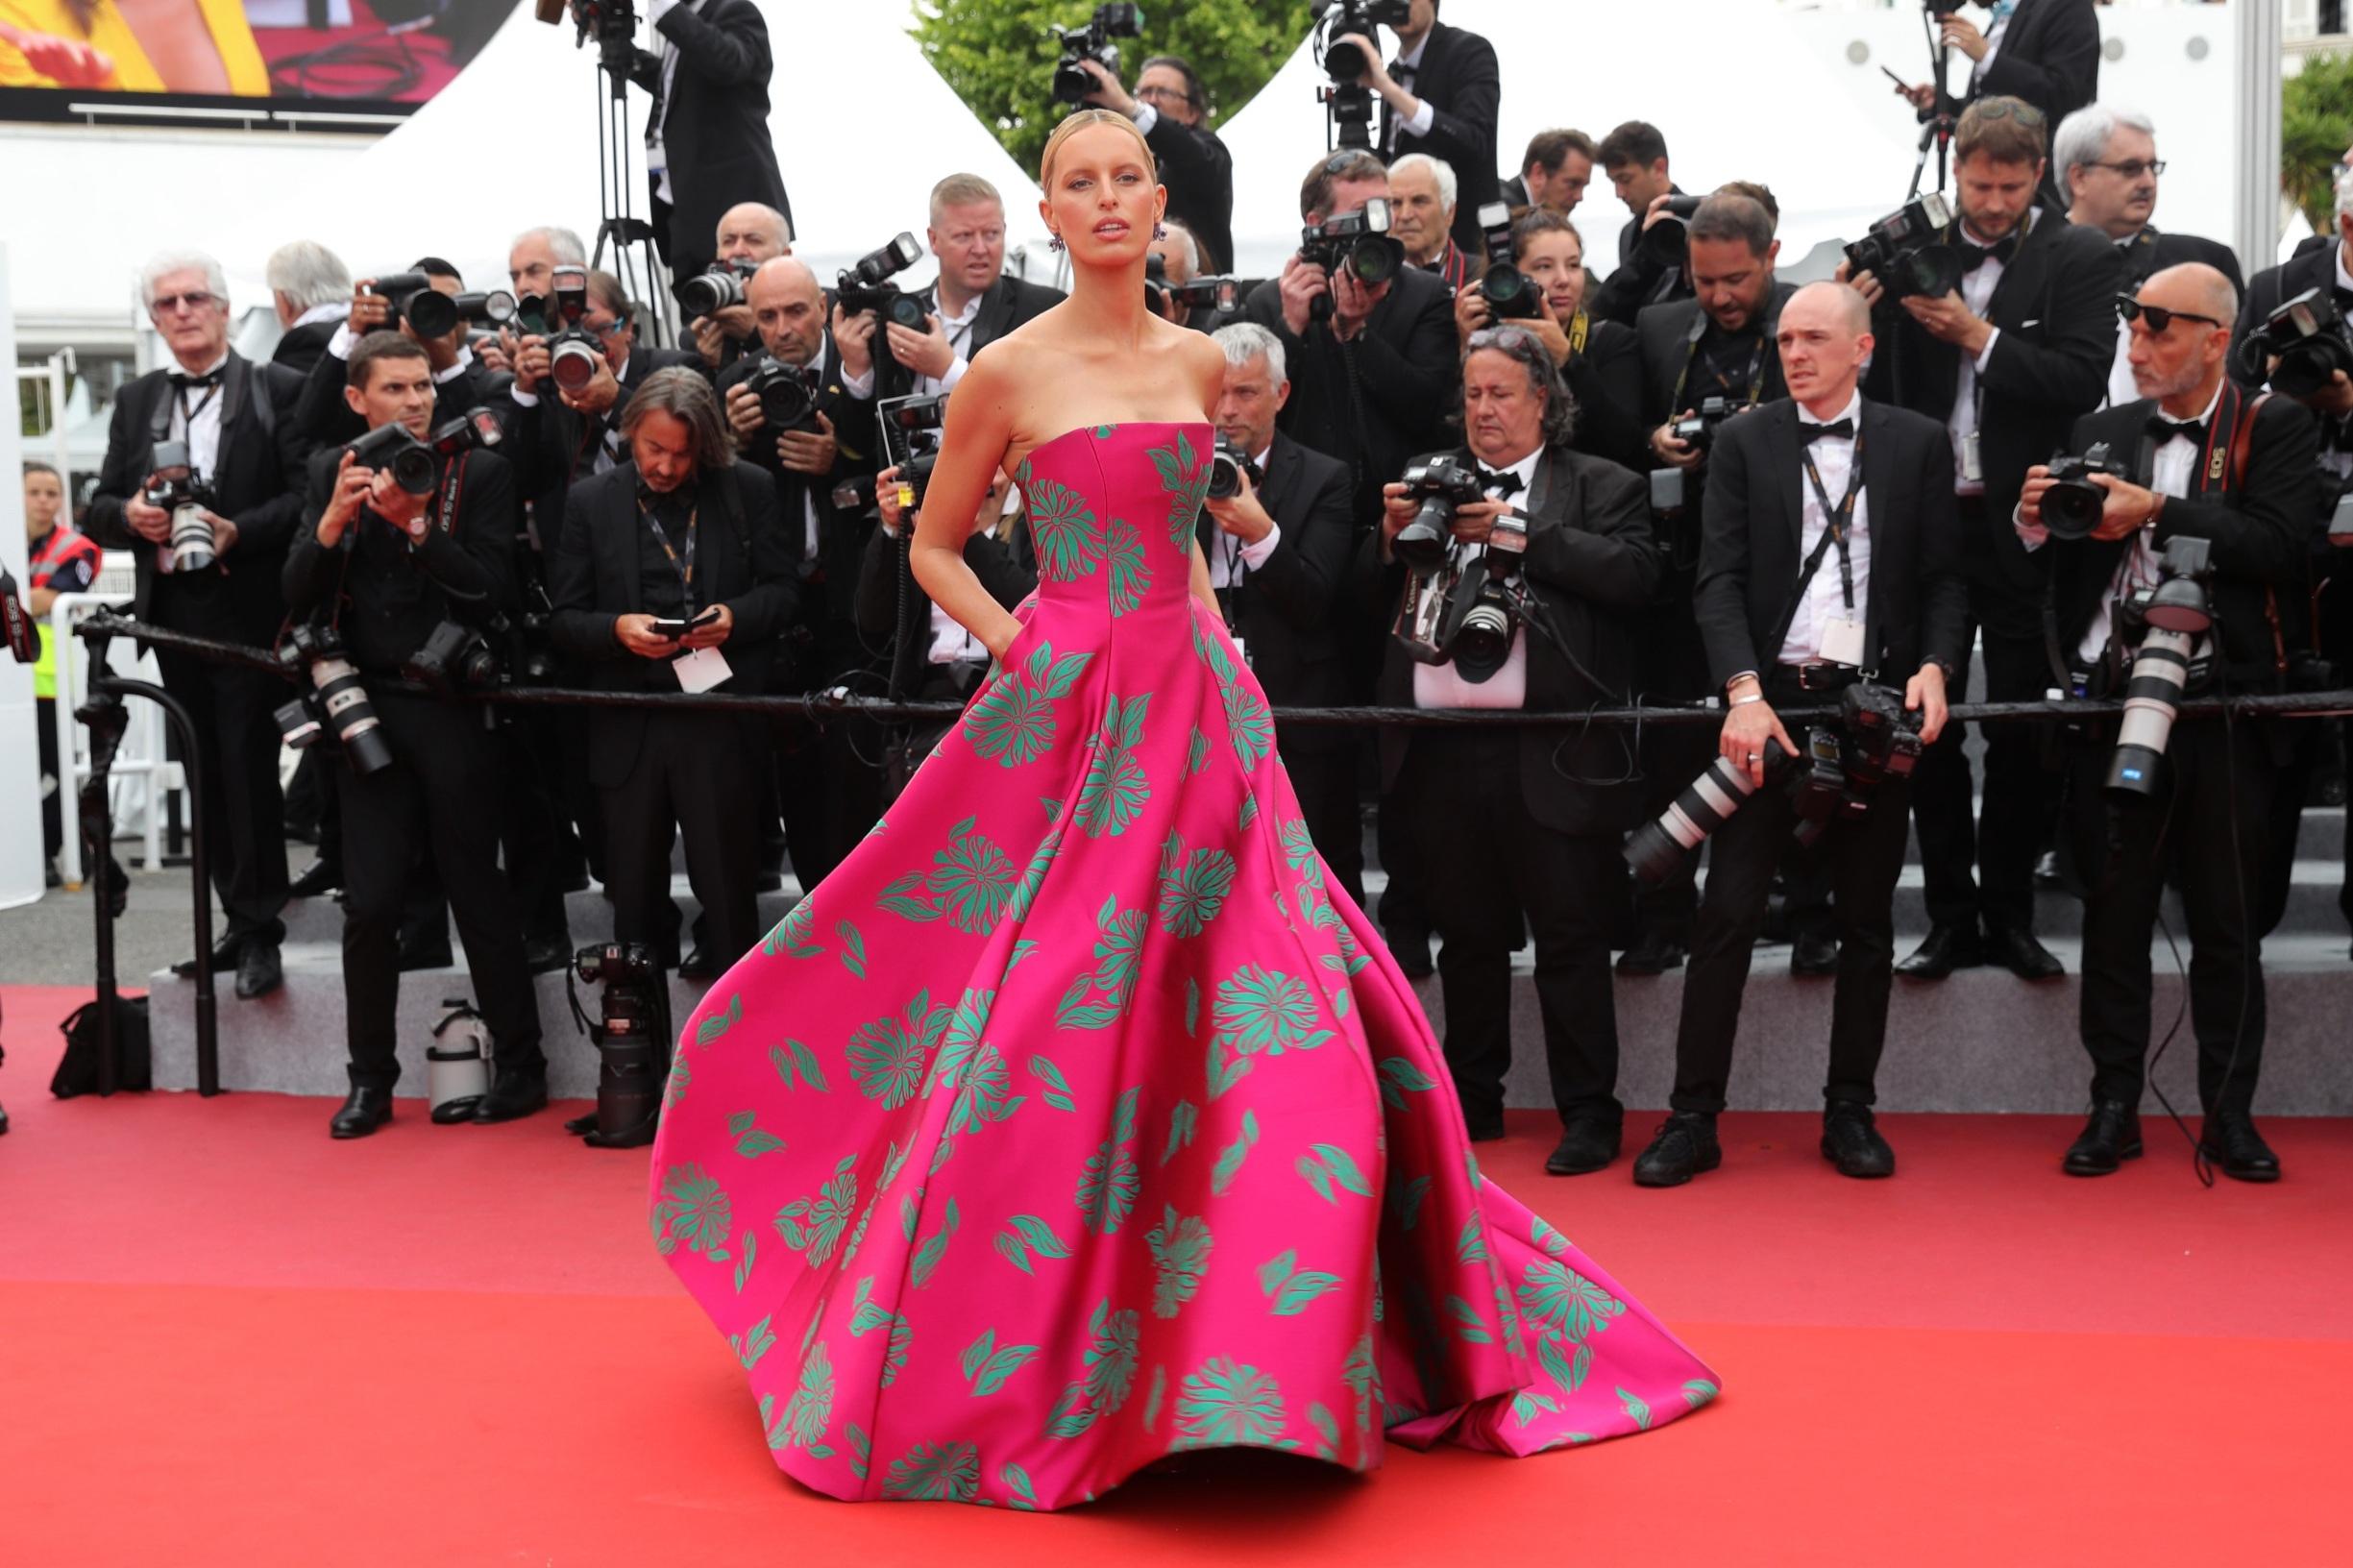 CANNES, FRANCE - MAY 21: Karolina Kurkova attends the screening of